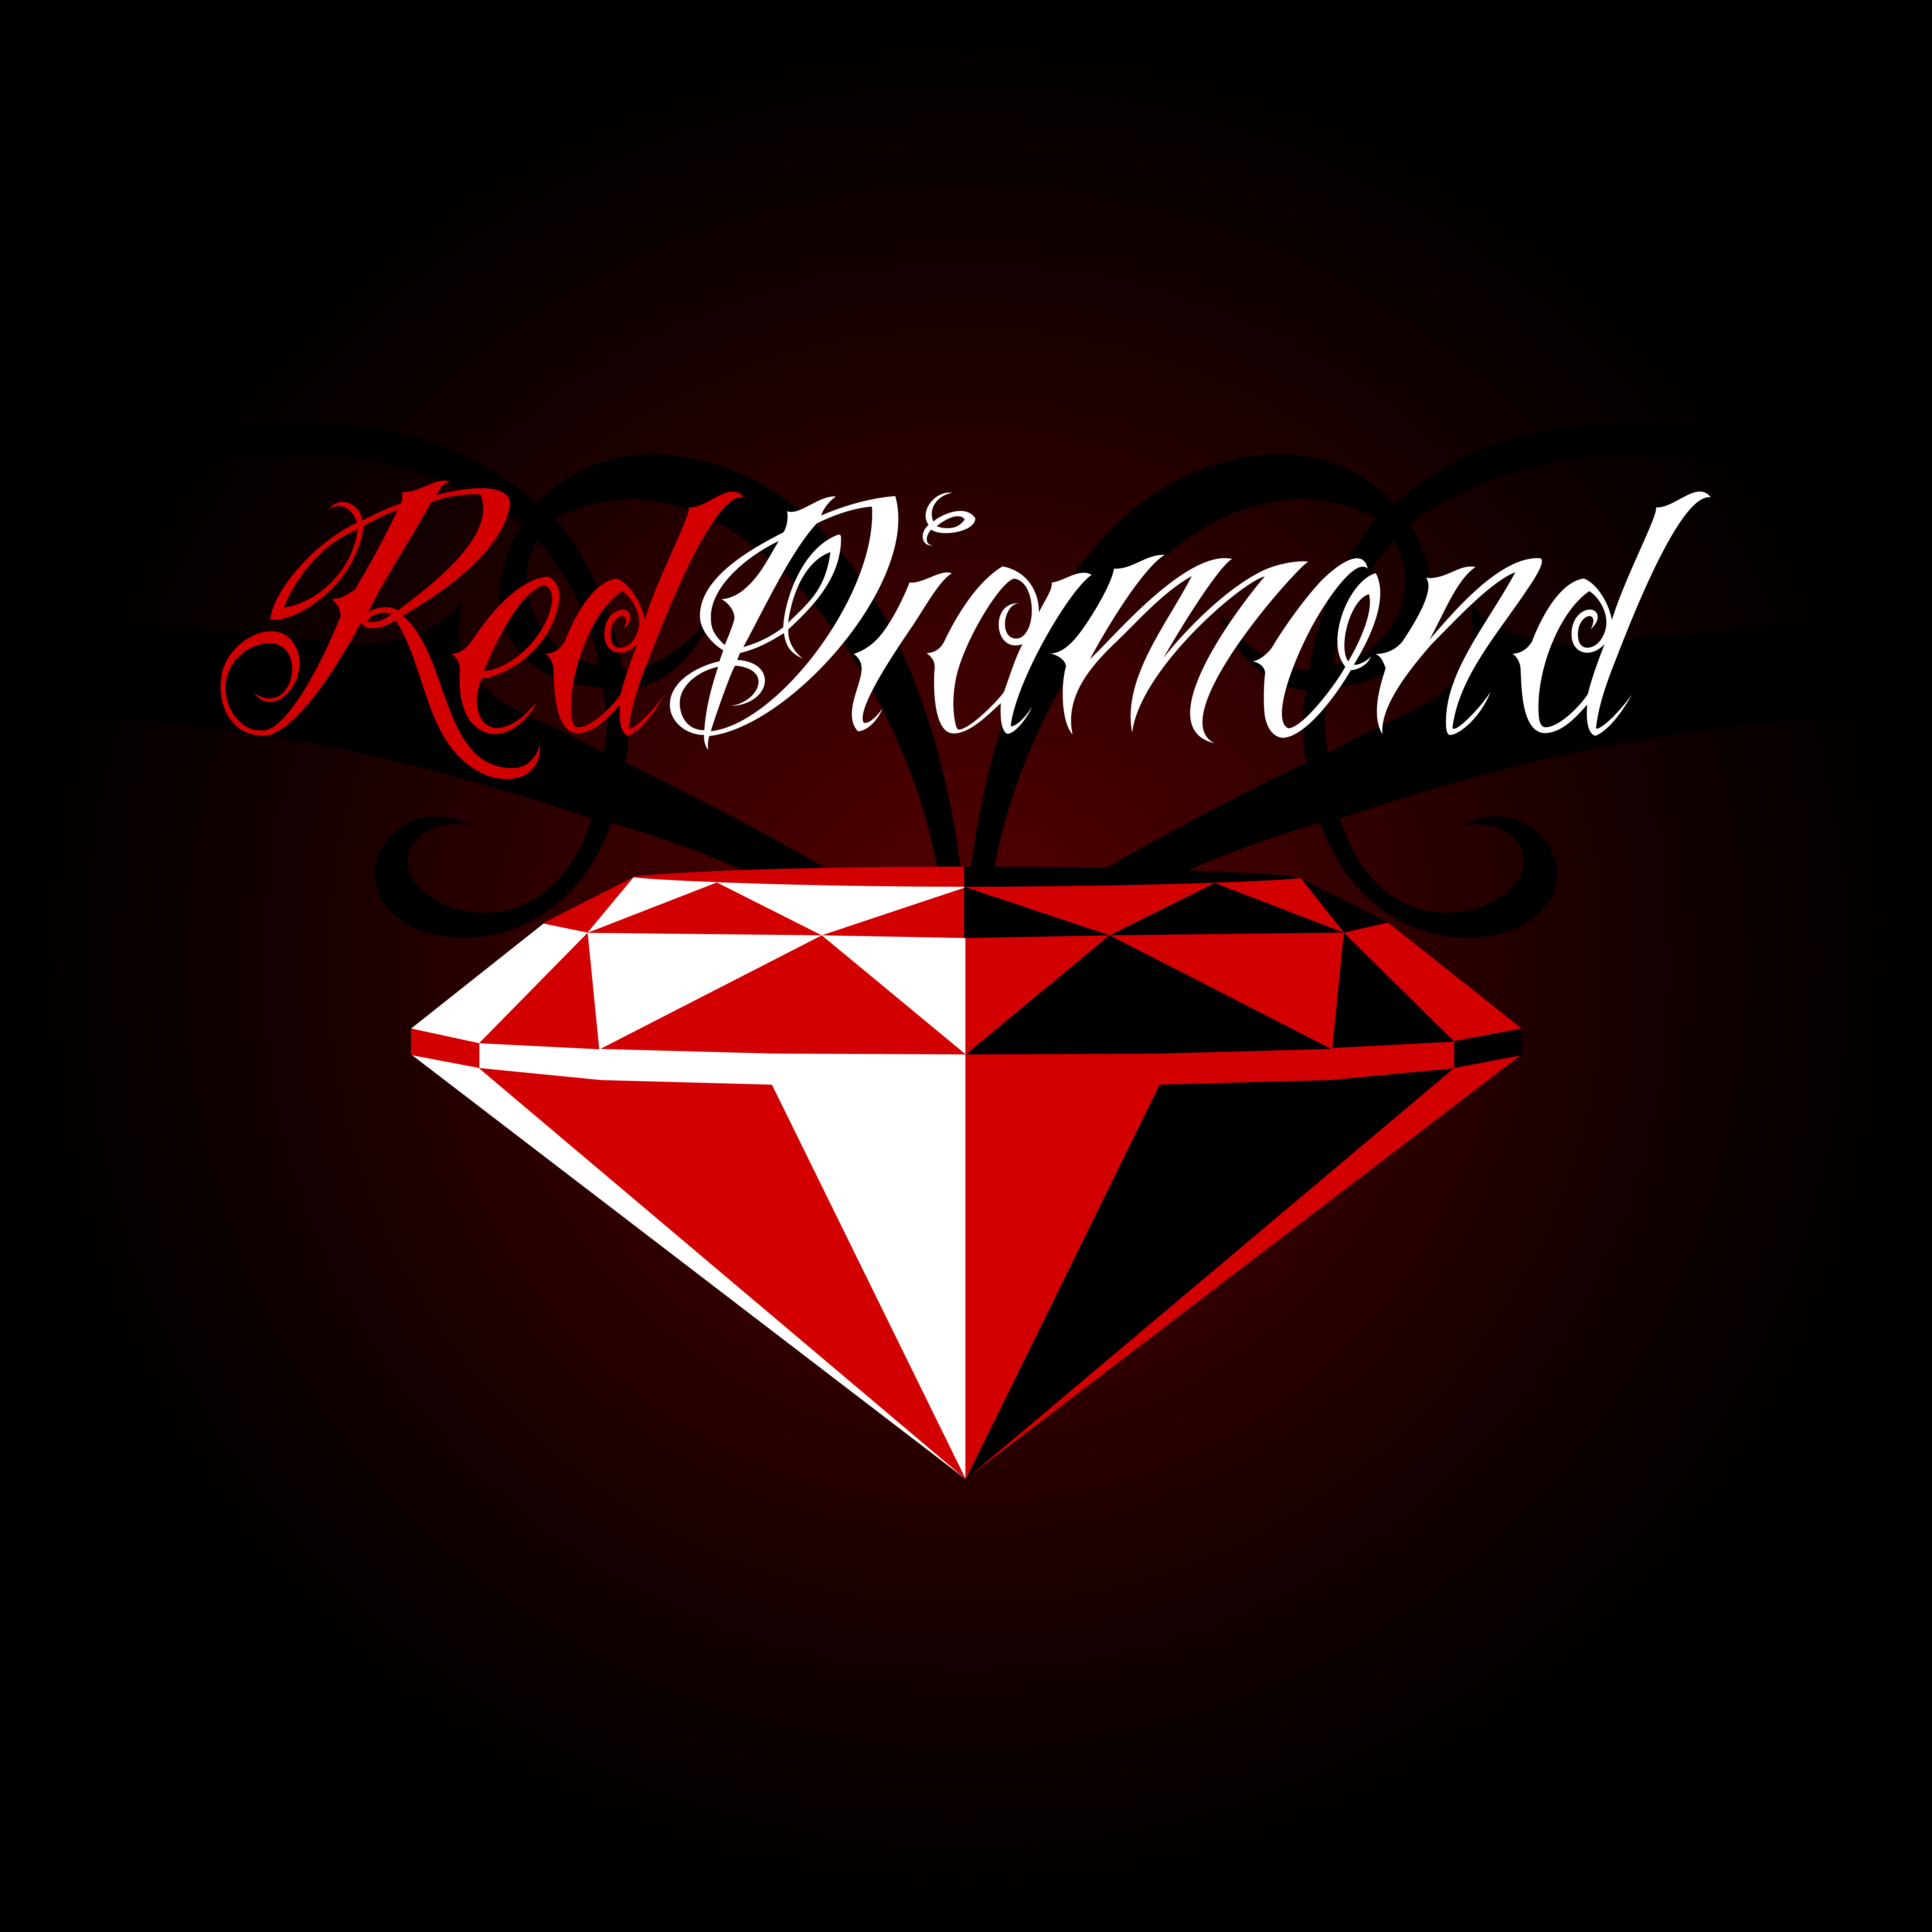 Wollpepar Diamond: Red Diamond Wallpaper